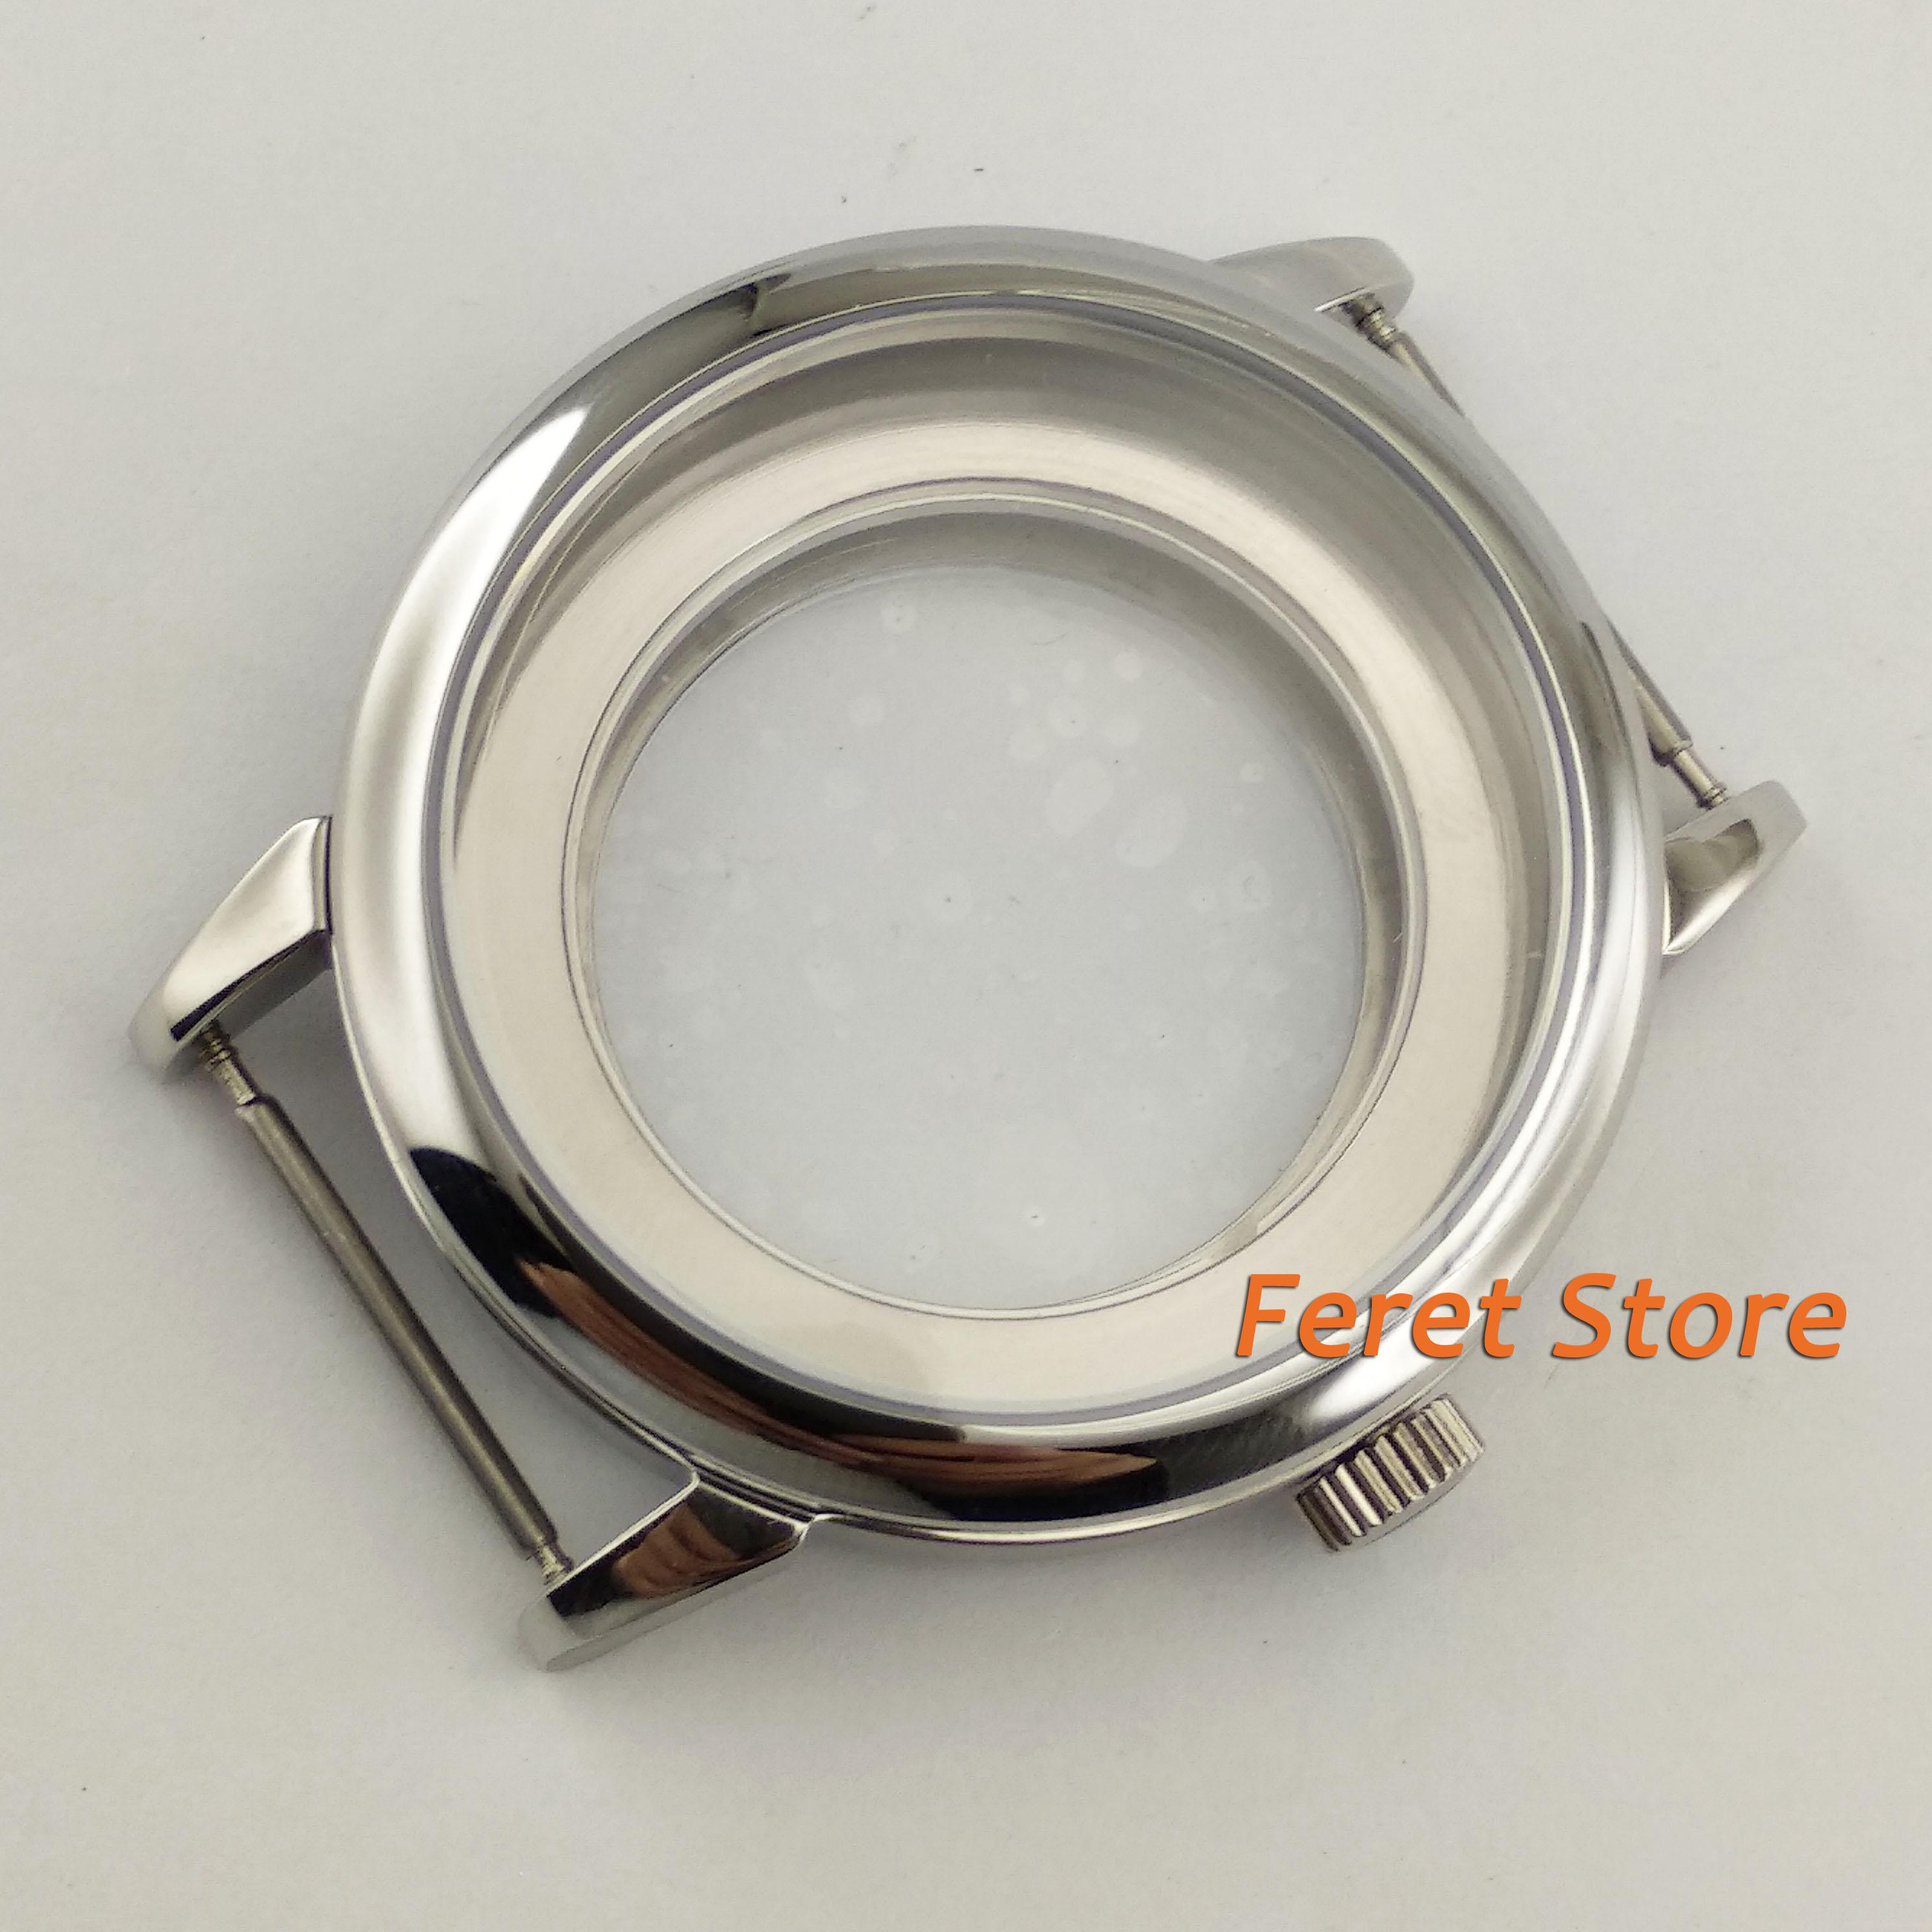 40mm Sapphire Glass watch Case Fit ETA 2836,DG2813/3804,Miyota 82 Series movement p57